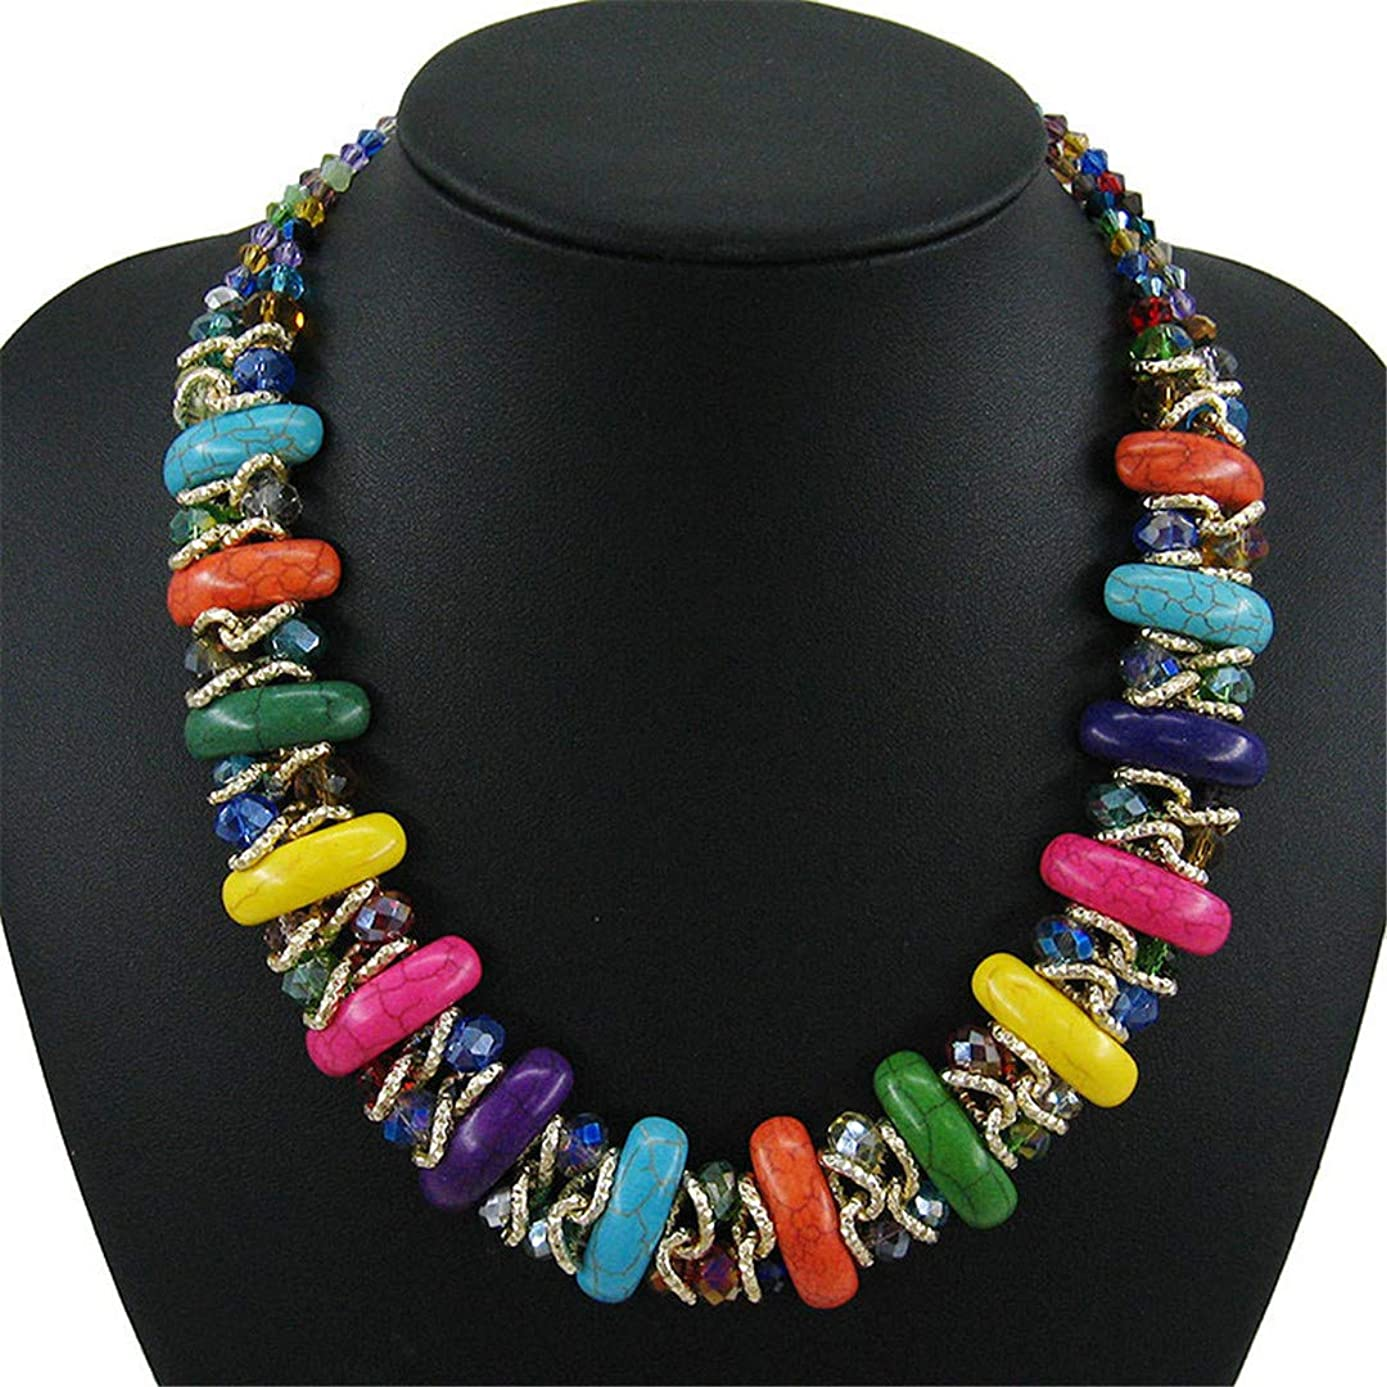 ZDHSQ Collier Femme Statement Necklace Fashion Women Collar Long Gold Chain Choker Necklaces & Pendants Jewelry Bijoux